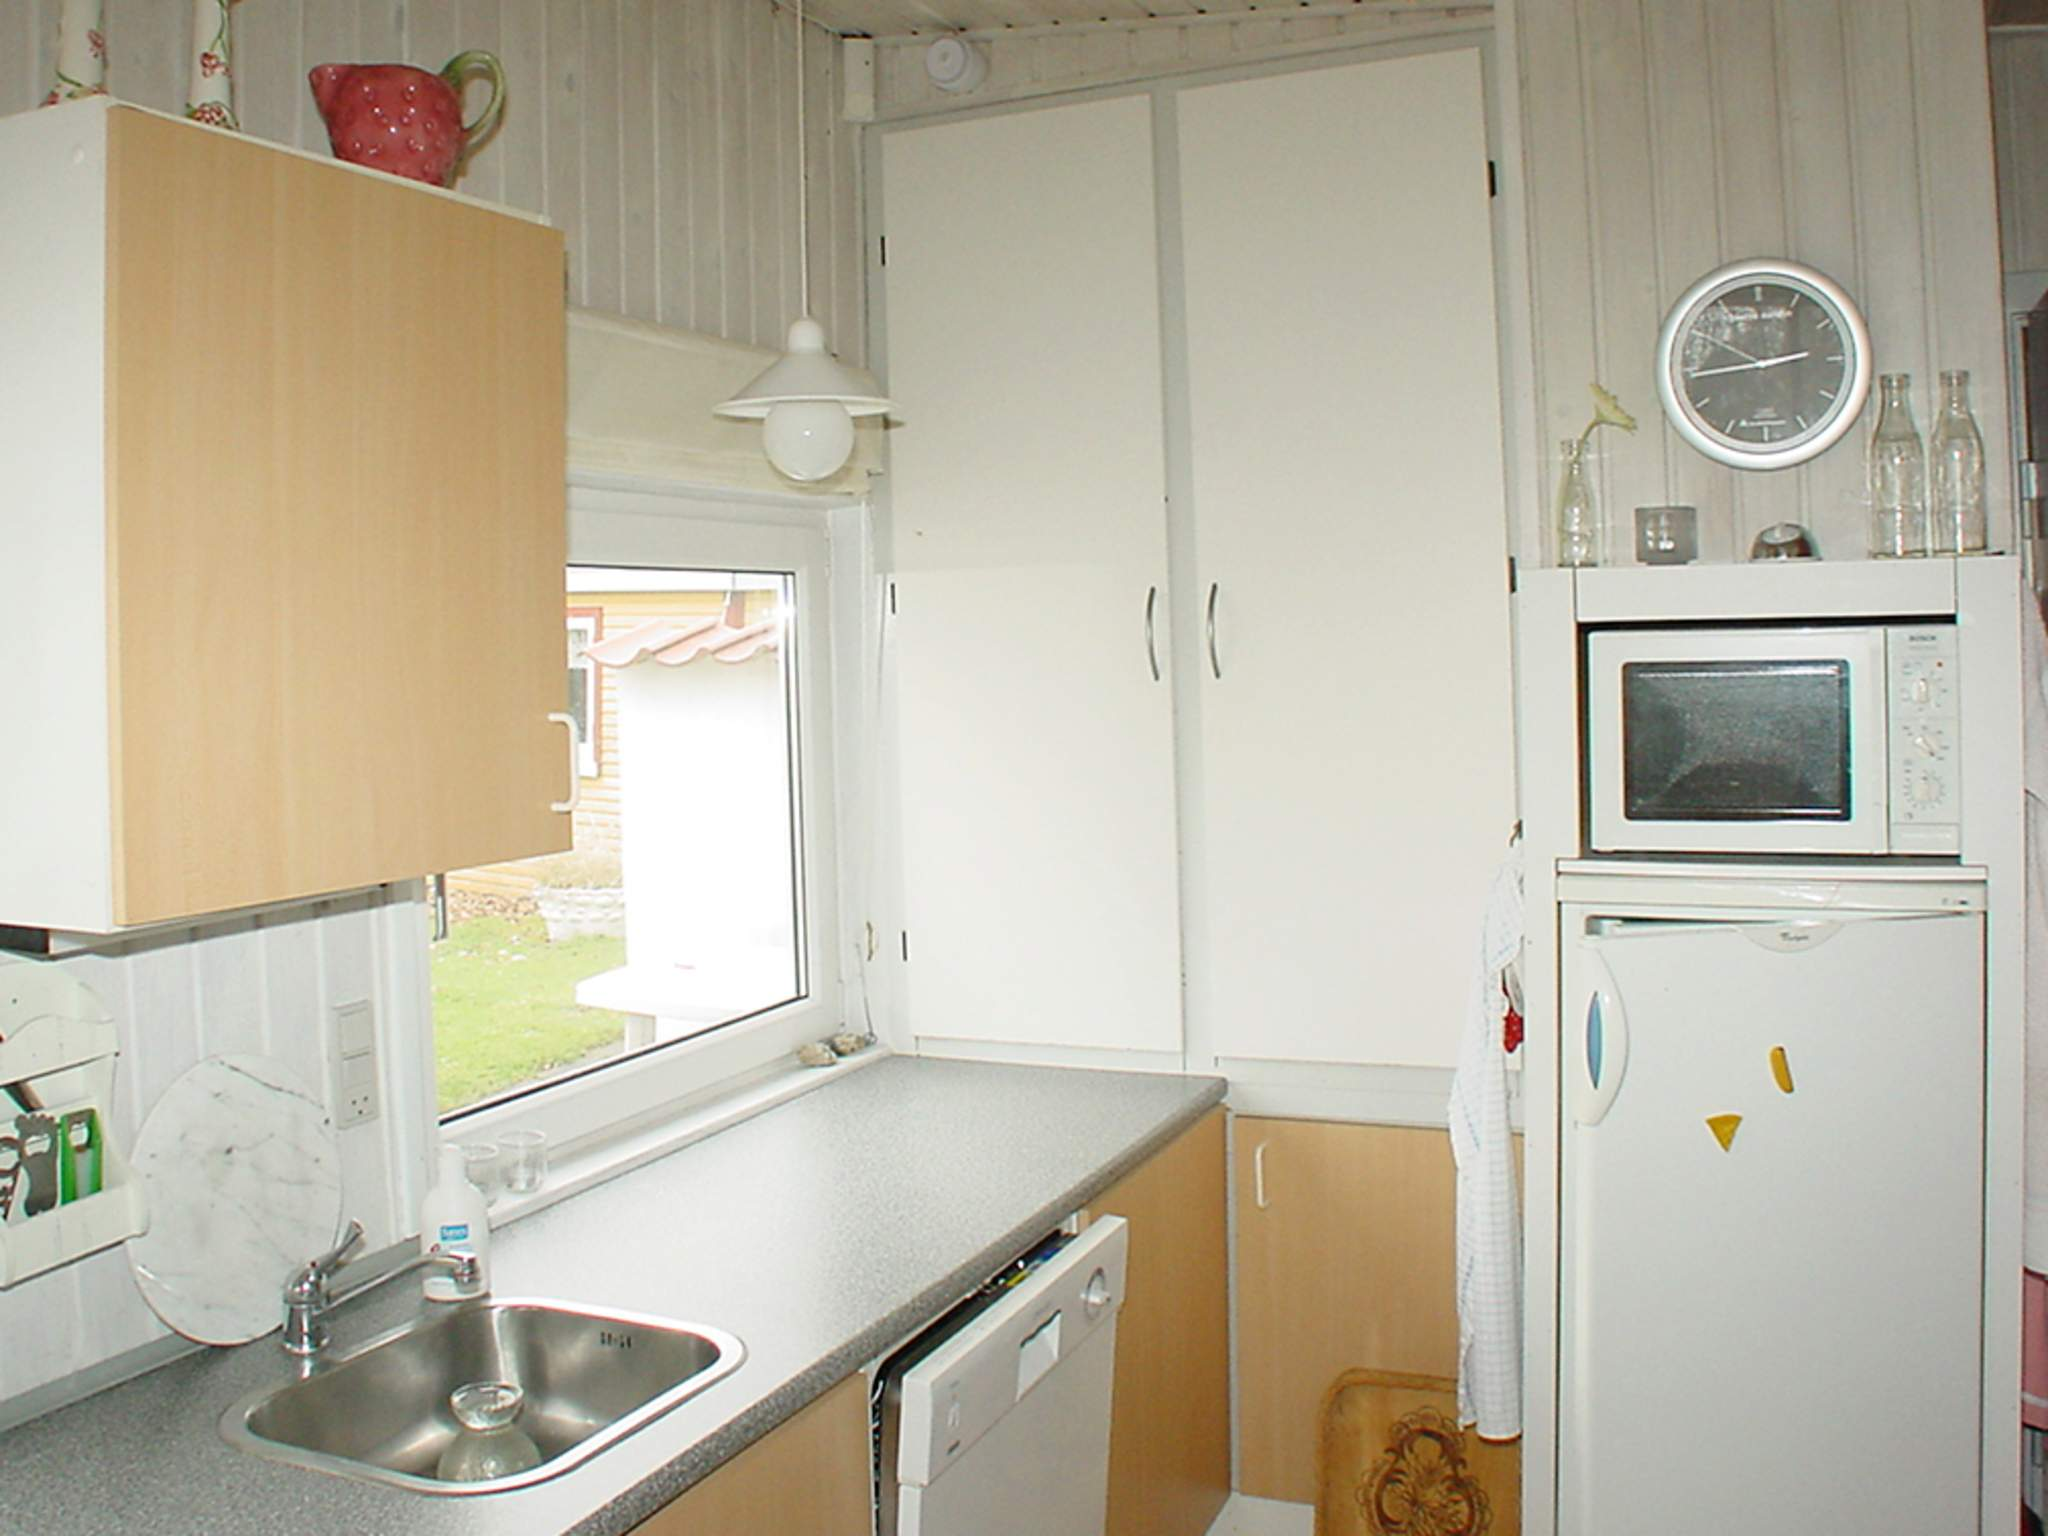 Ferienhaus Øster Hurup (226841), Øster Hurup, , Dänische Ostsee, Dänemark, Bild 7